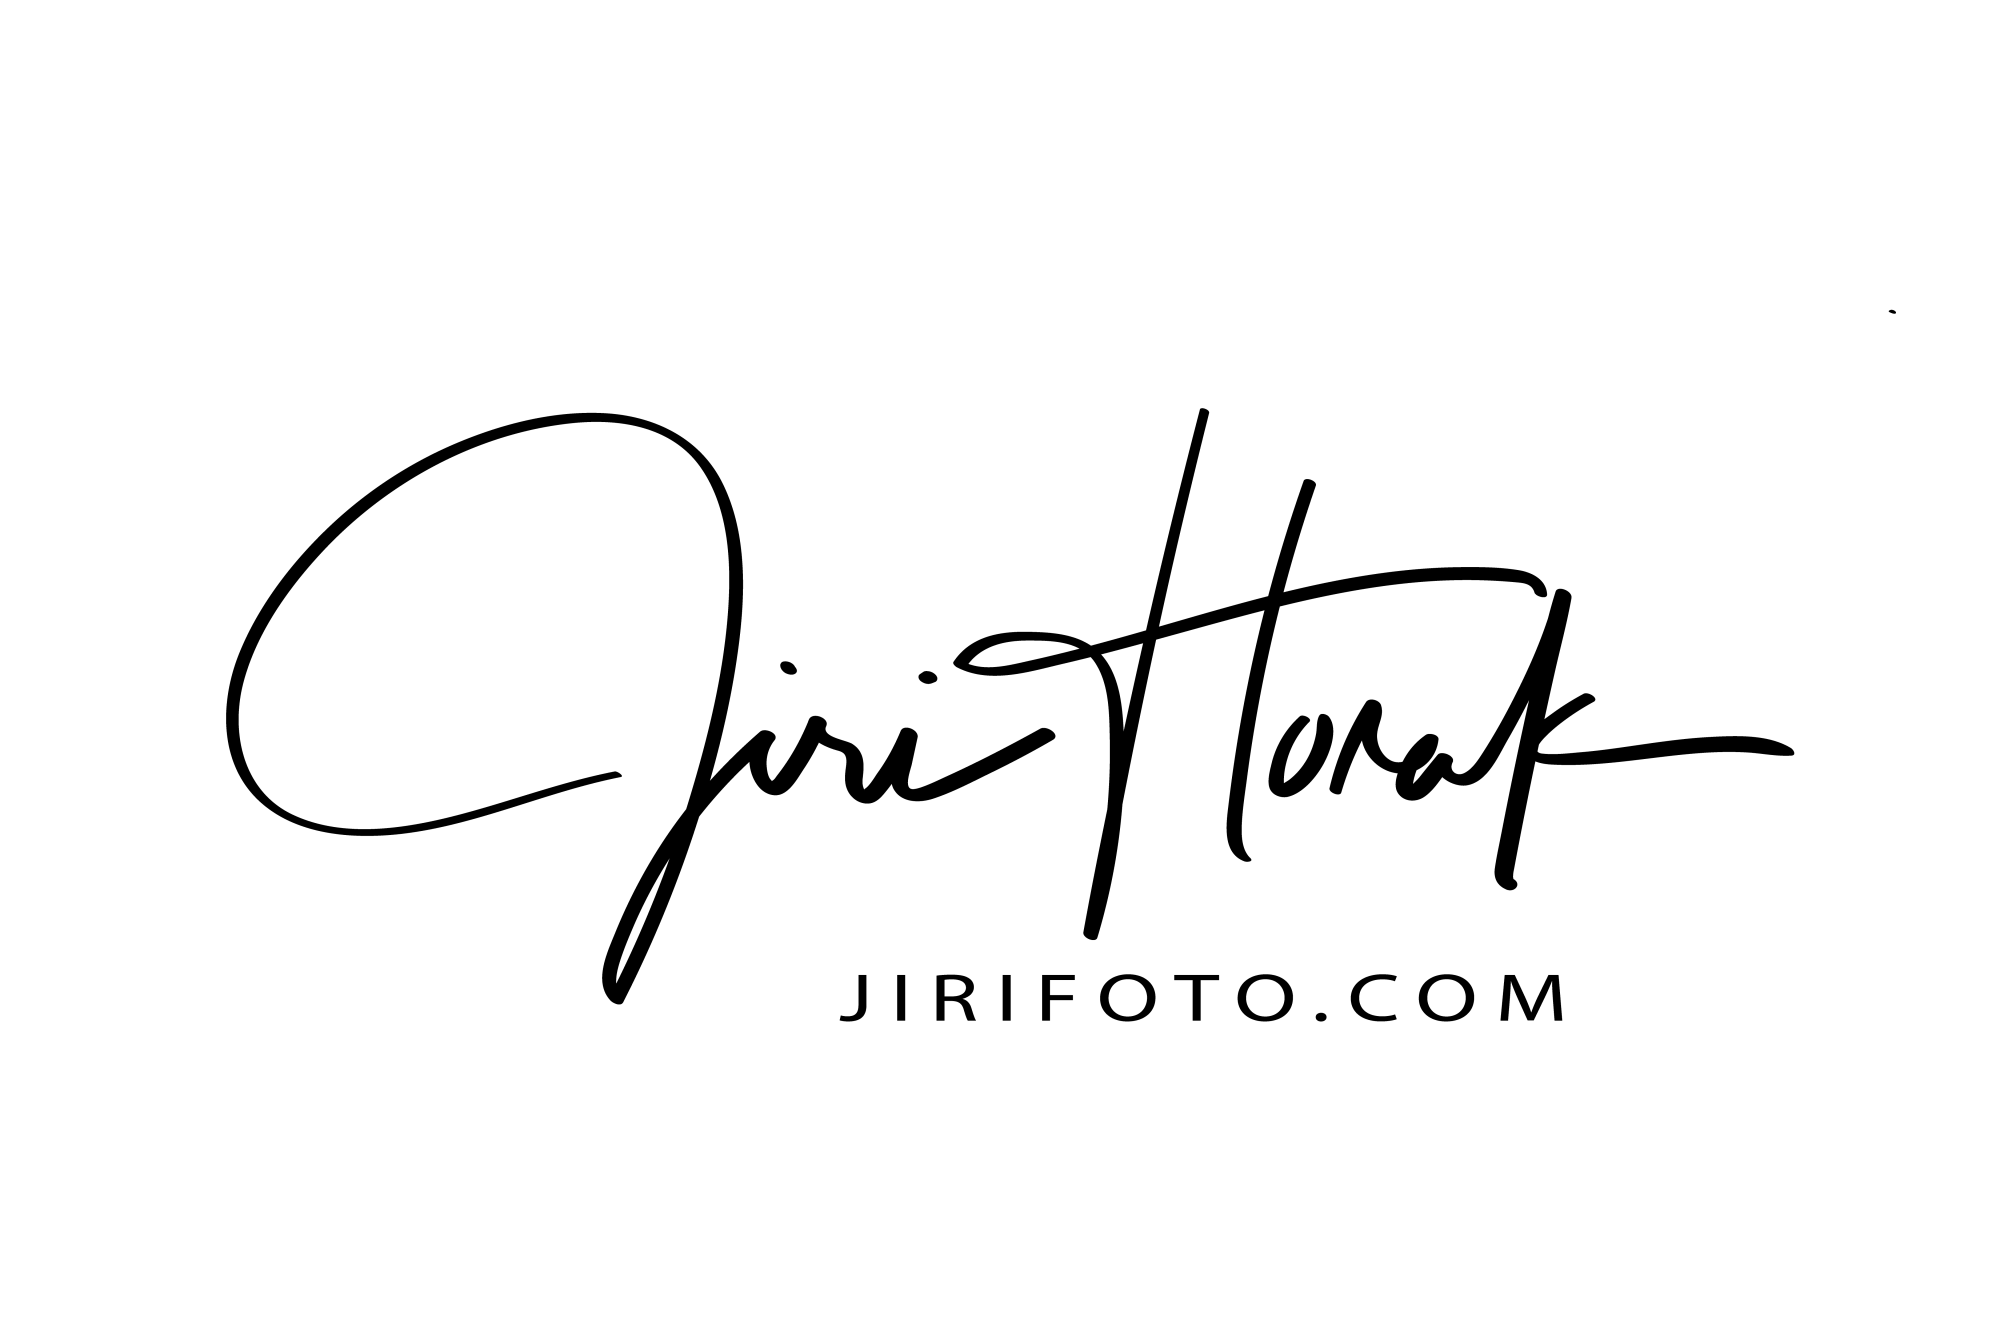 JIRIFOTO